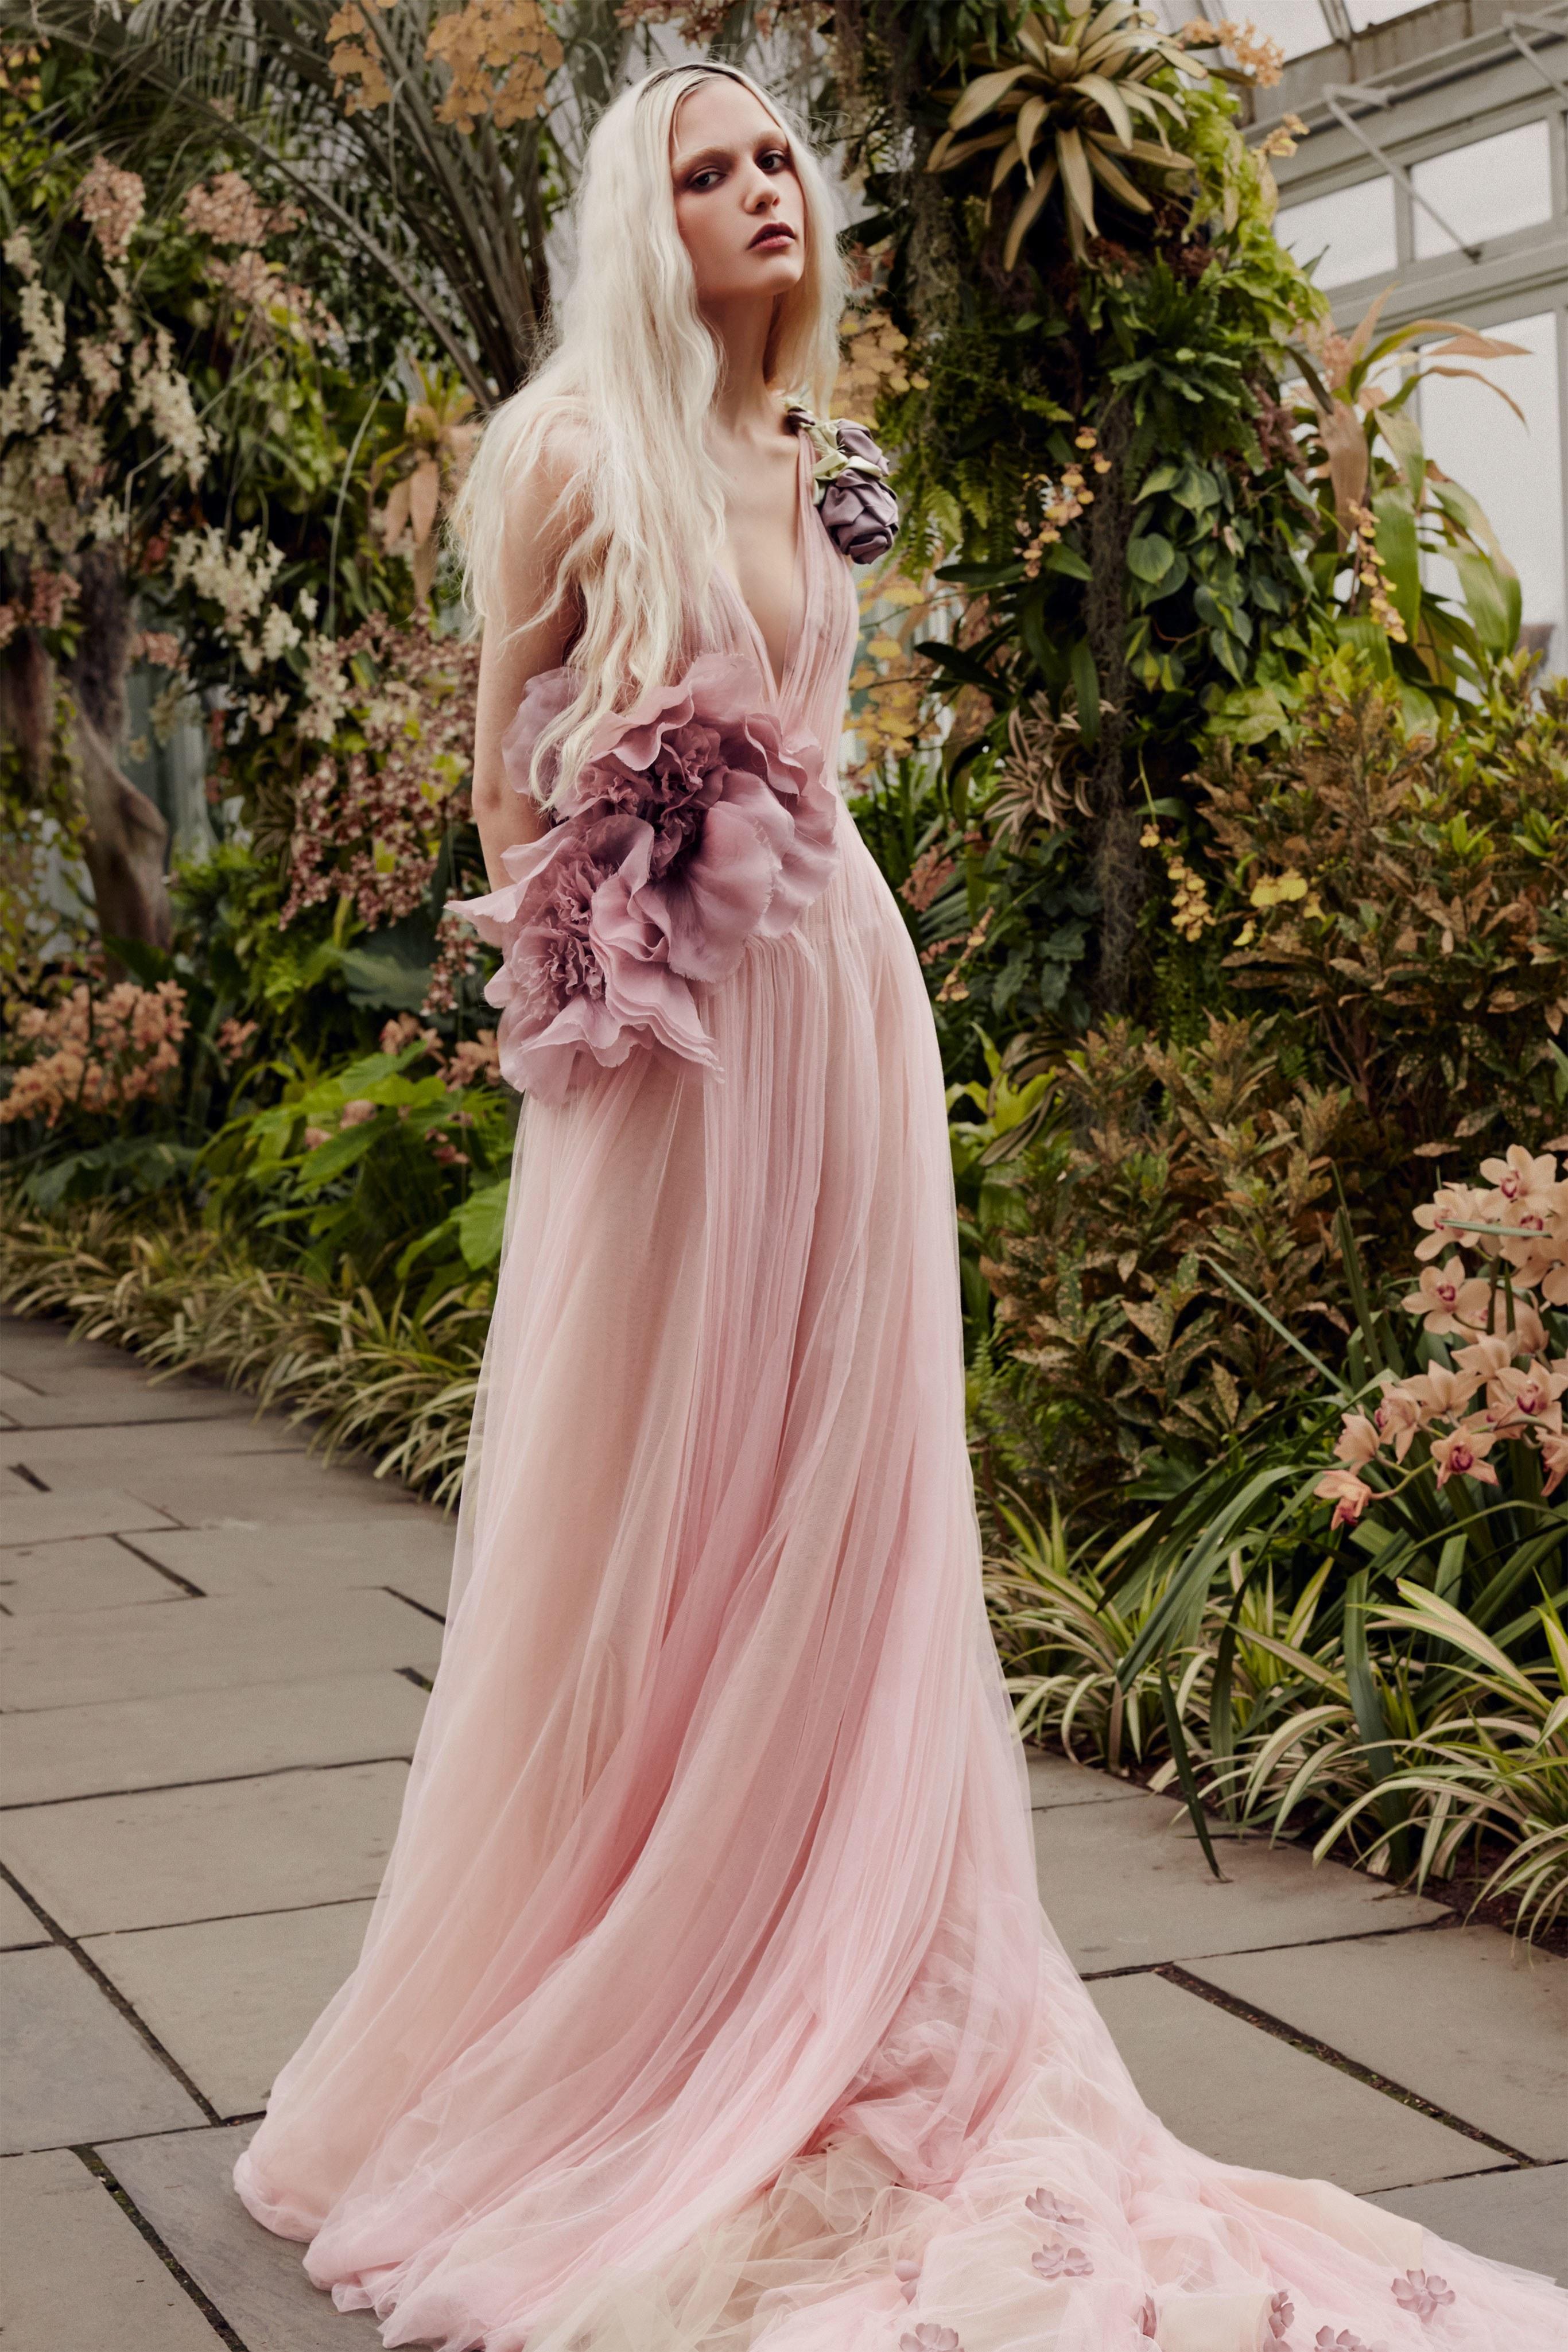 Cinnamon Rose Dress